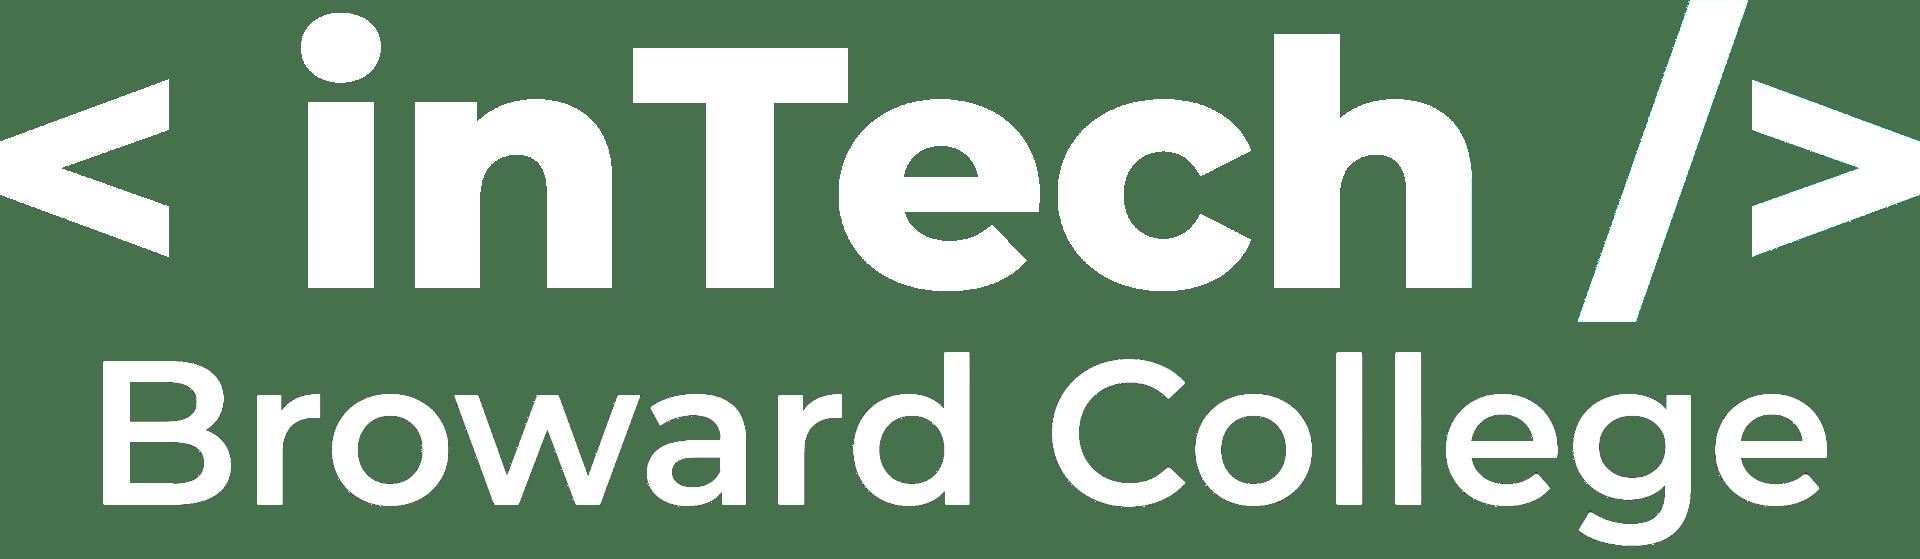 inTech club logo